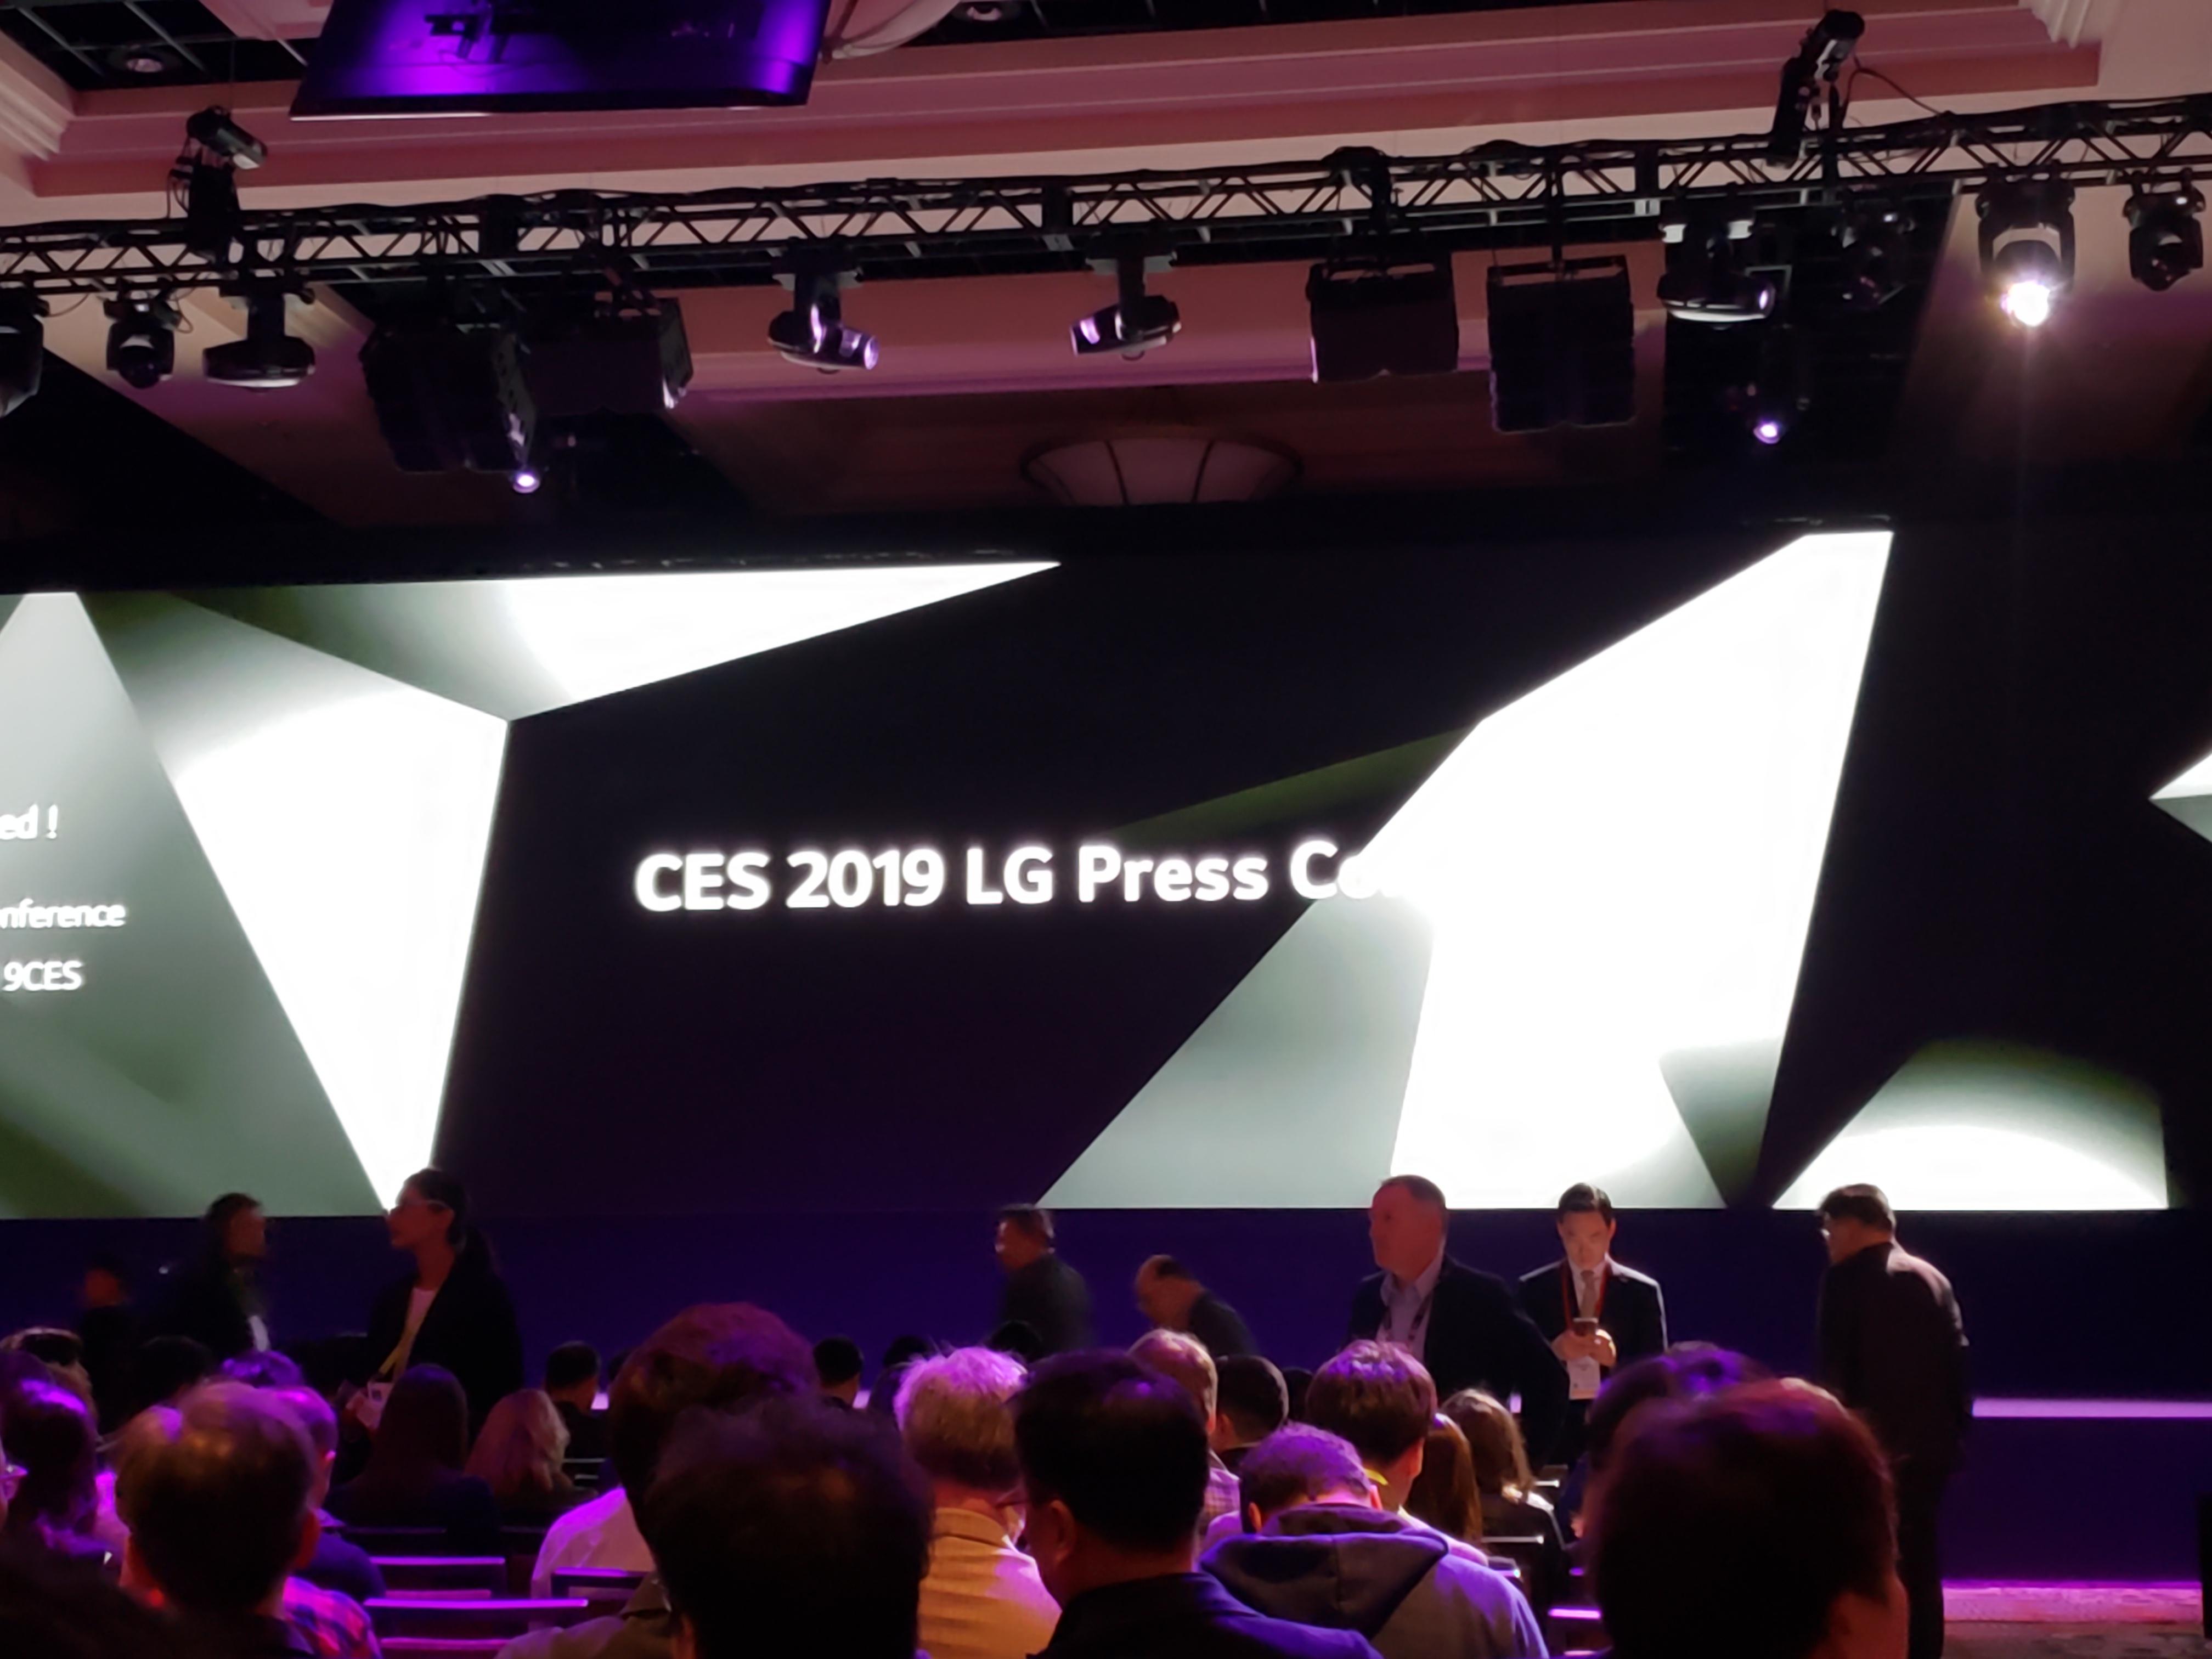 CES 2019: LG Press Event (starts 8am PT, 4pm UTC)